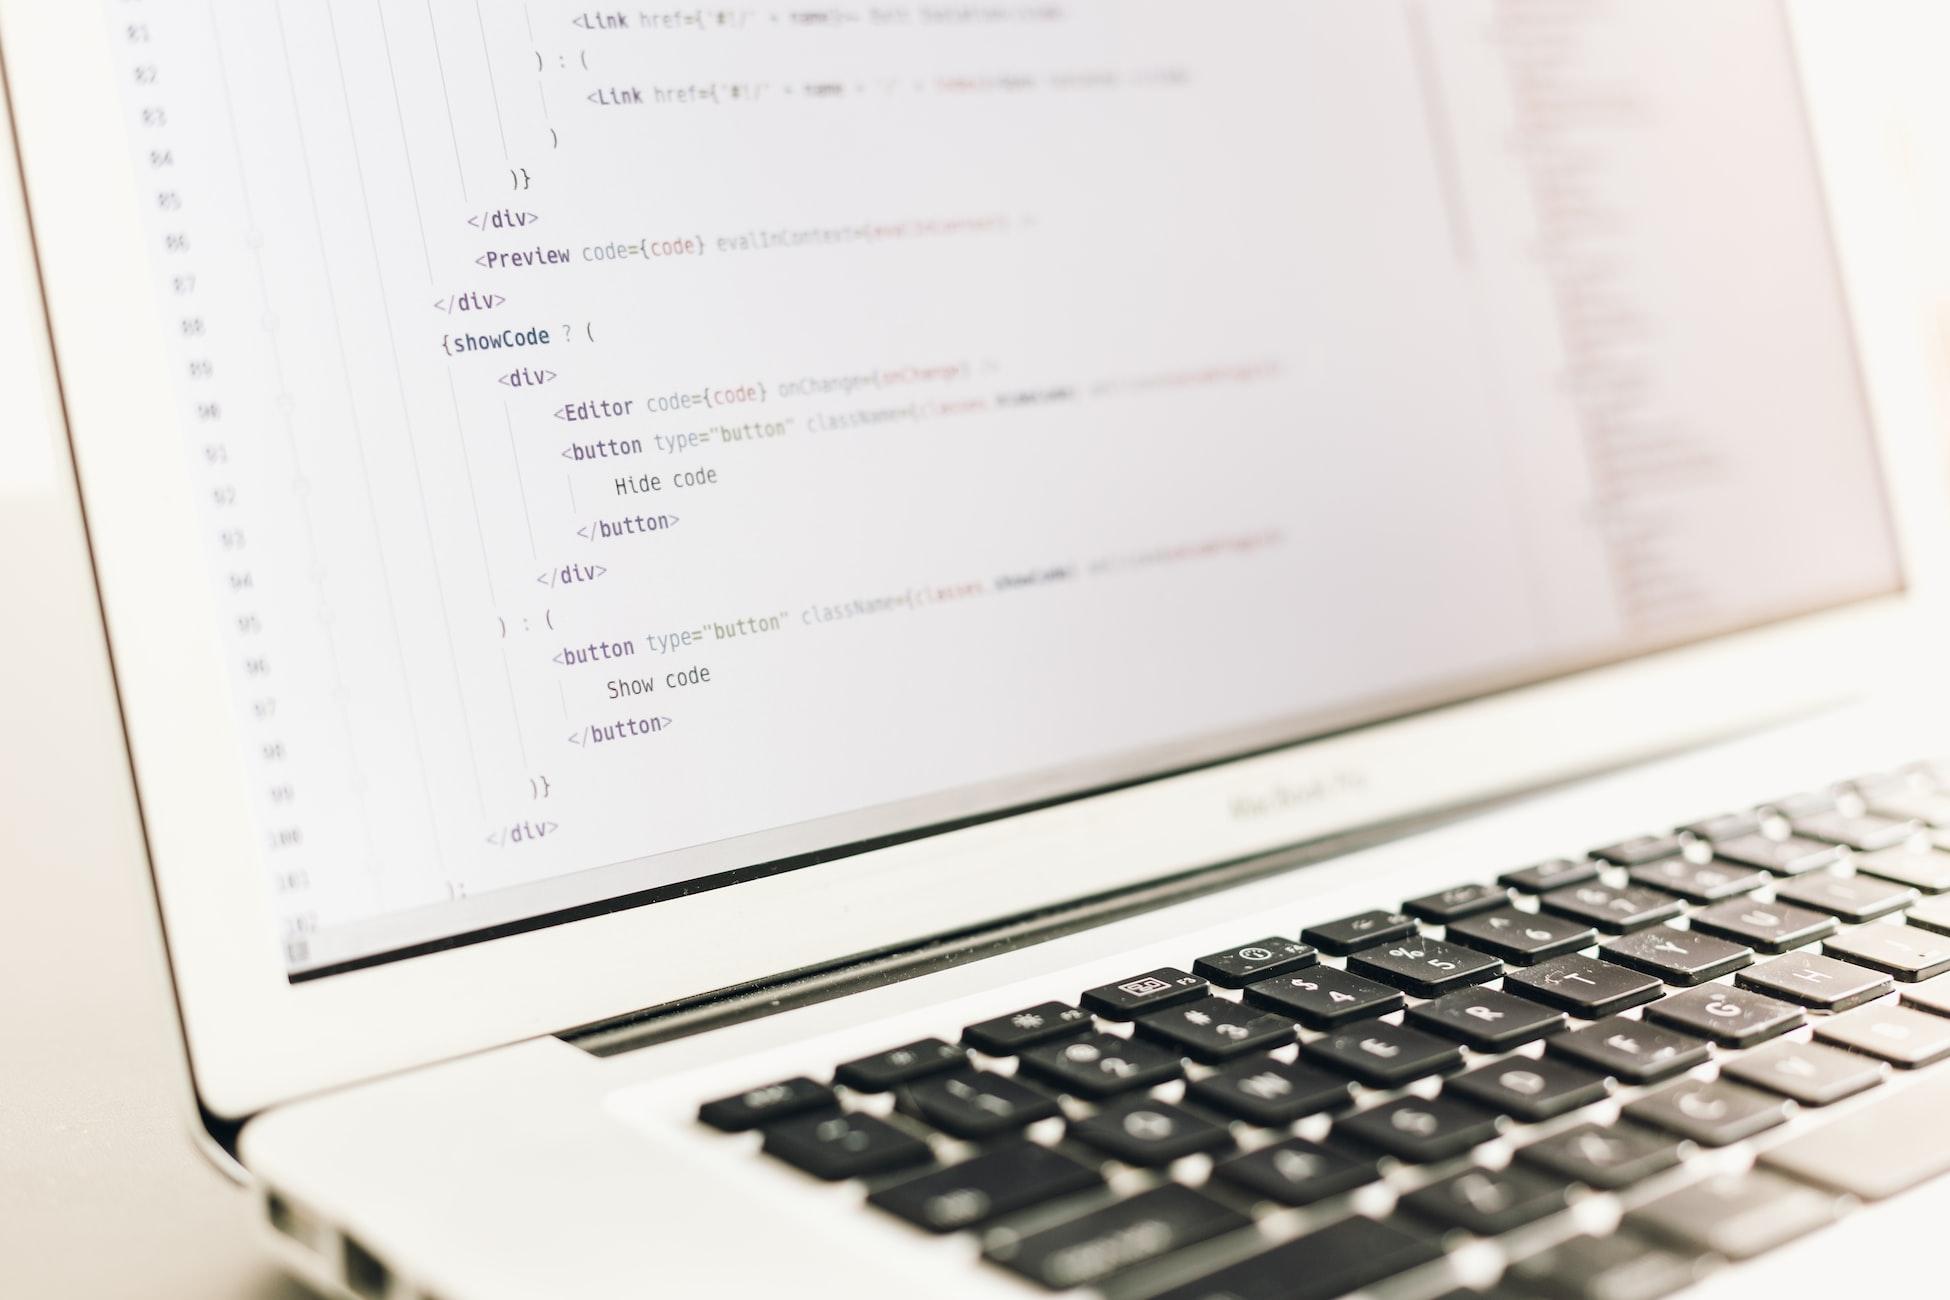 Installing Community-Built VS Code on a Chromebook